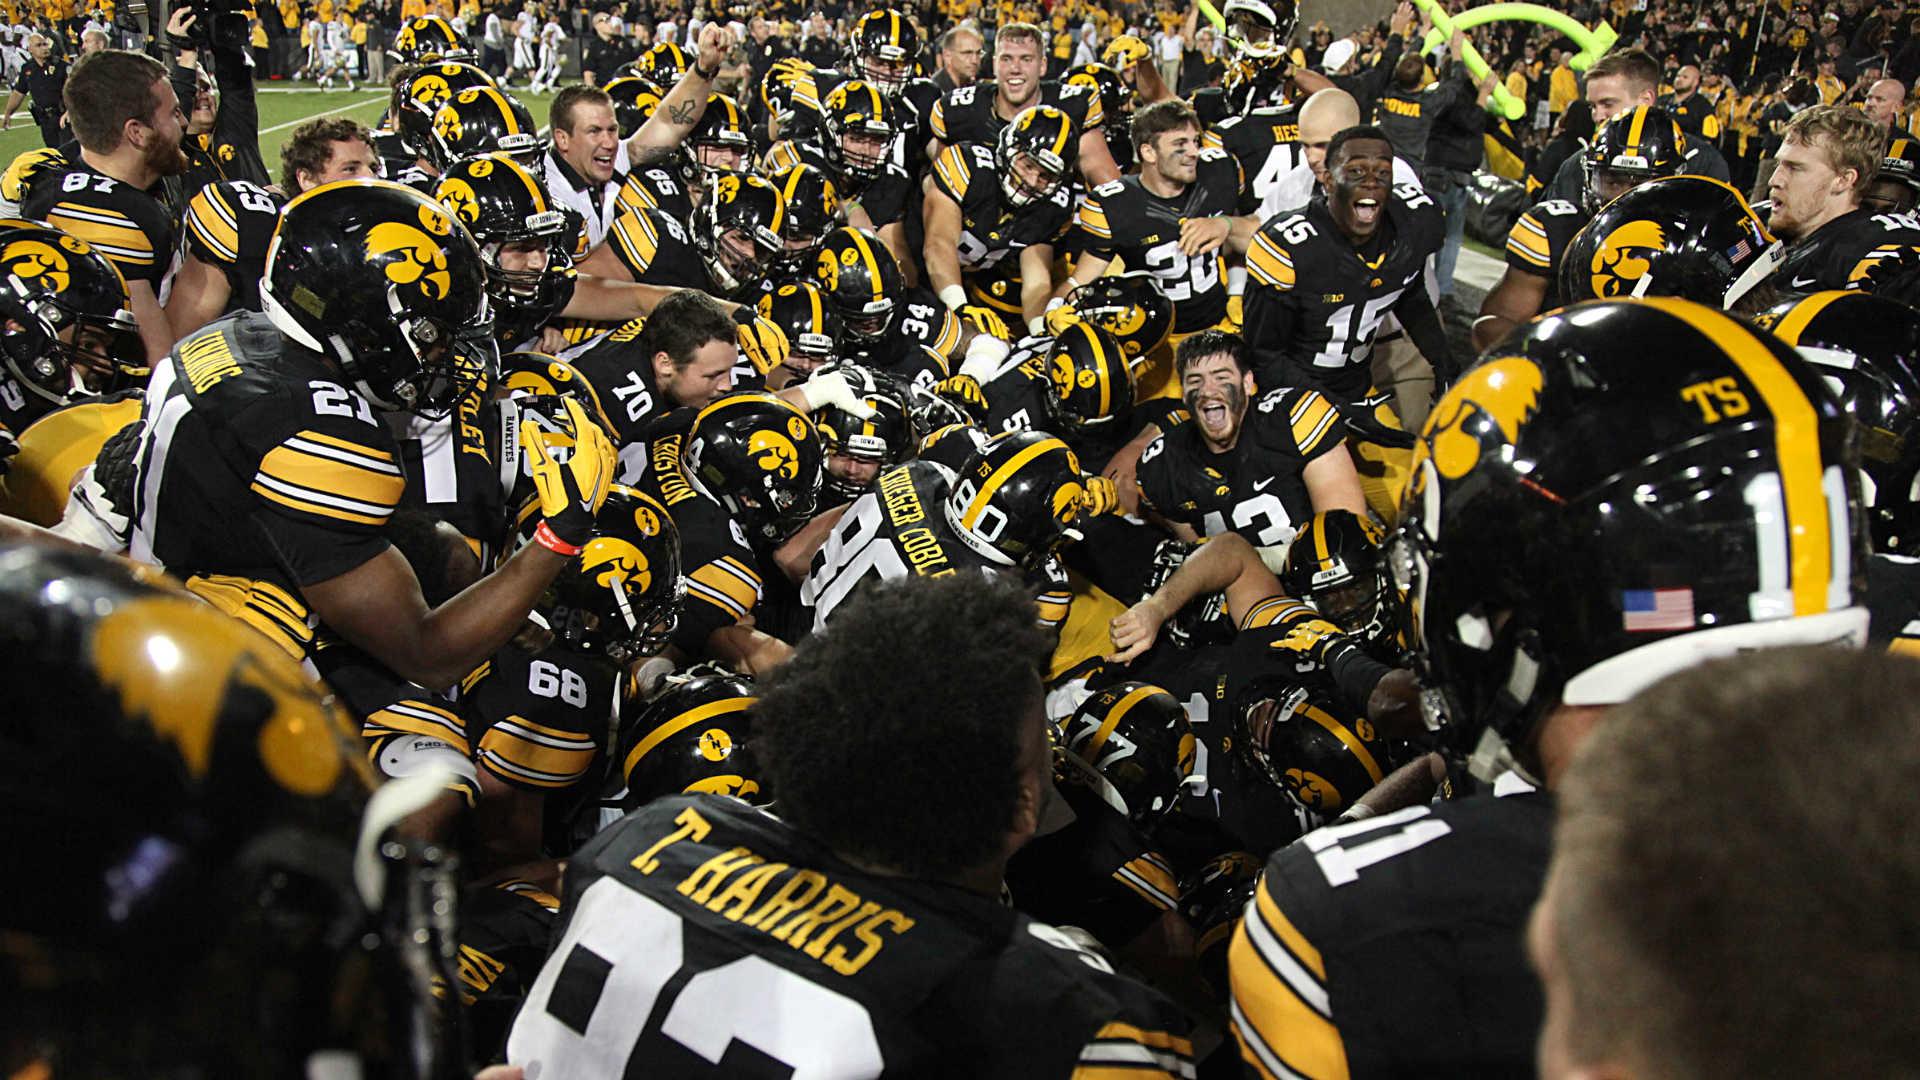 Iowa, Kirk Ferentz find QB, leader they need in C.J. Beathard   NCAA  Football   Sporting News